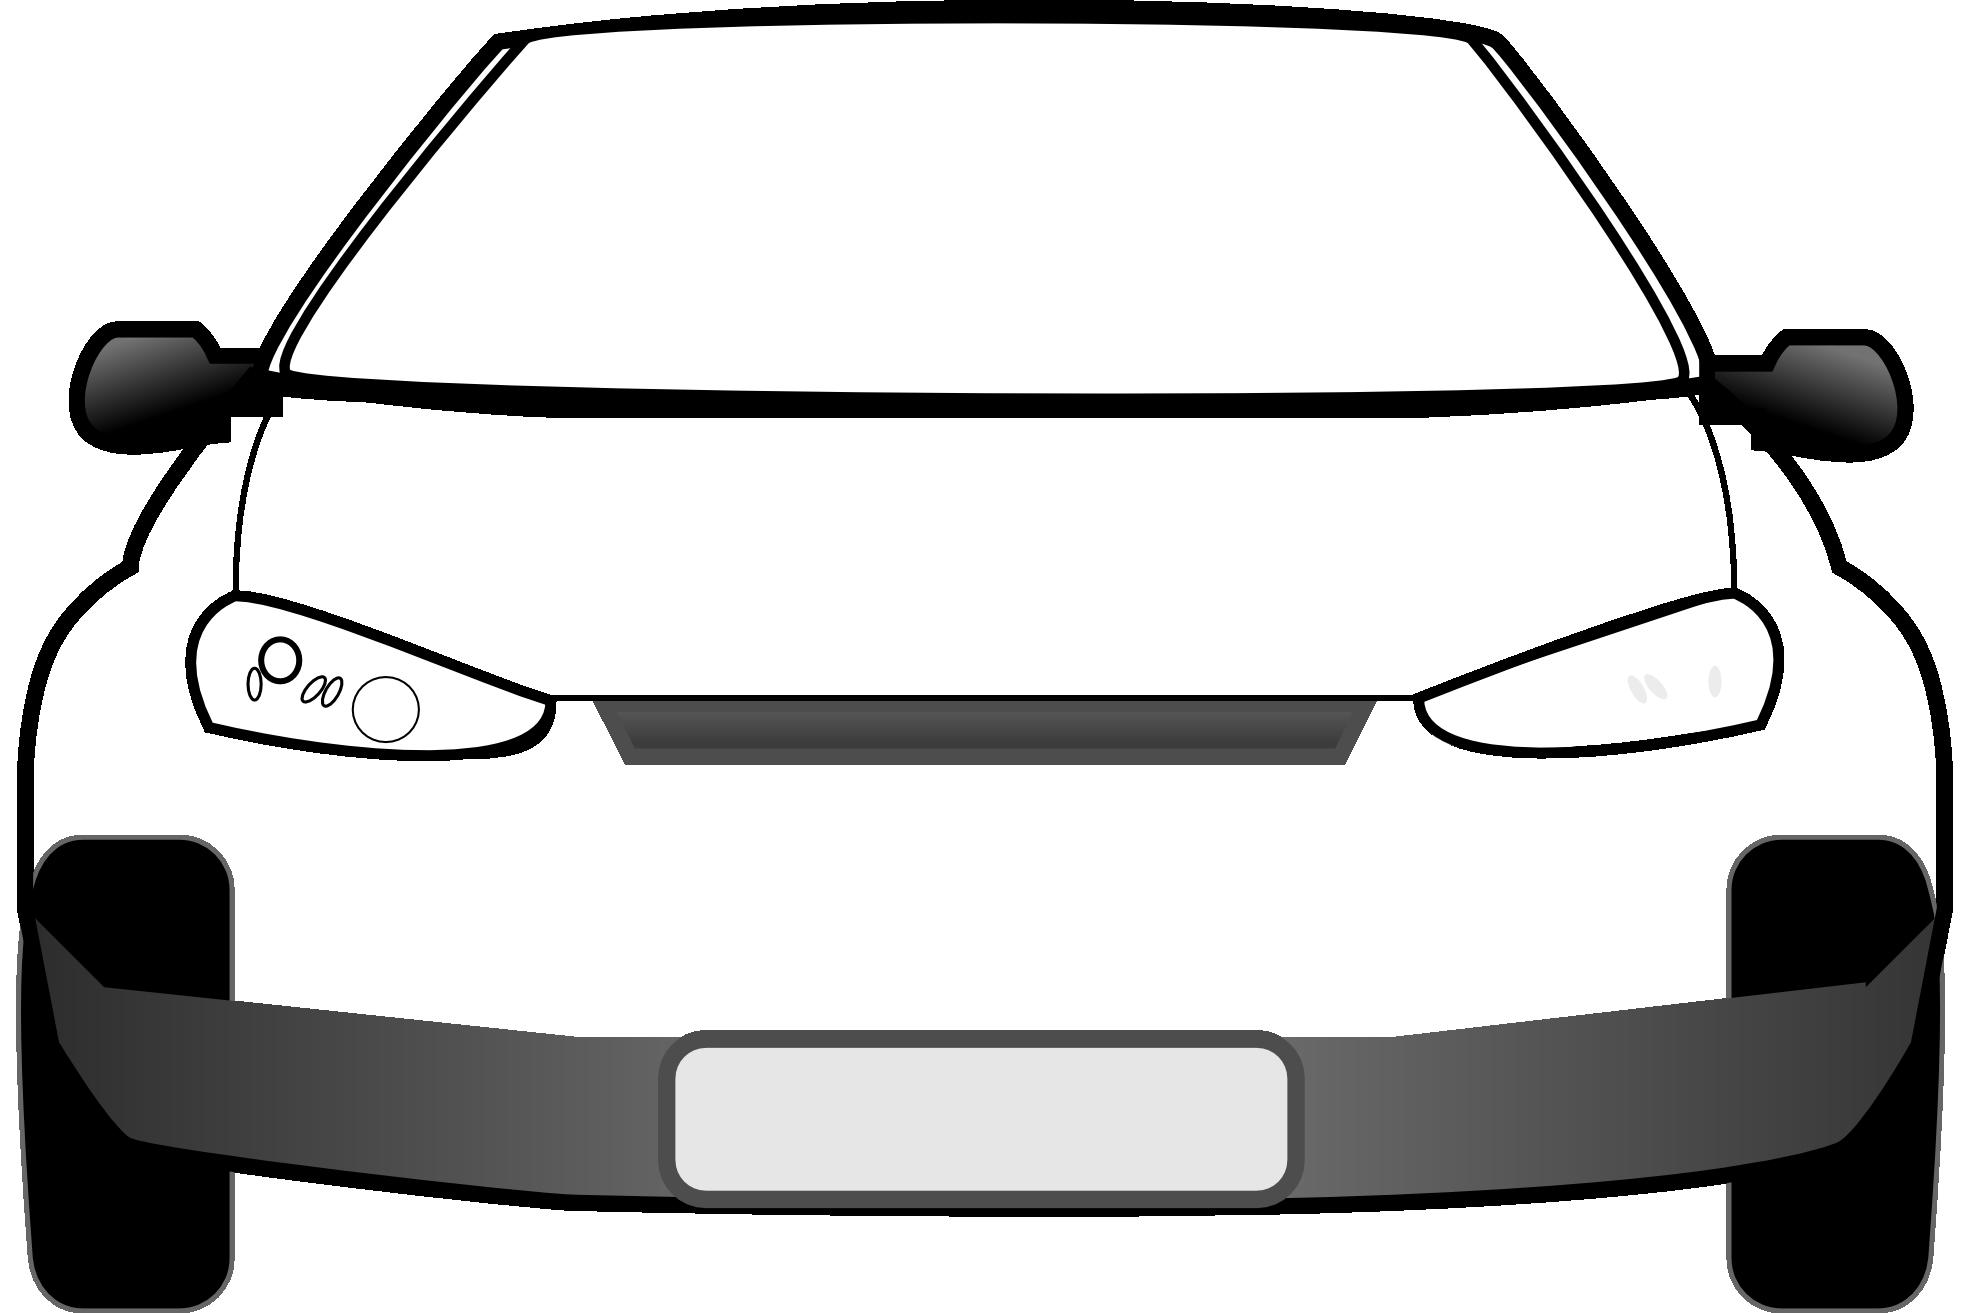 Car radio clipart black and white clip freeuse stock Black And White Car Clipart Image Group (68+) clip freeuse stock